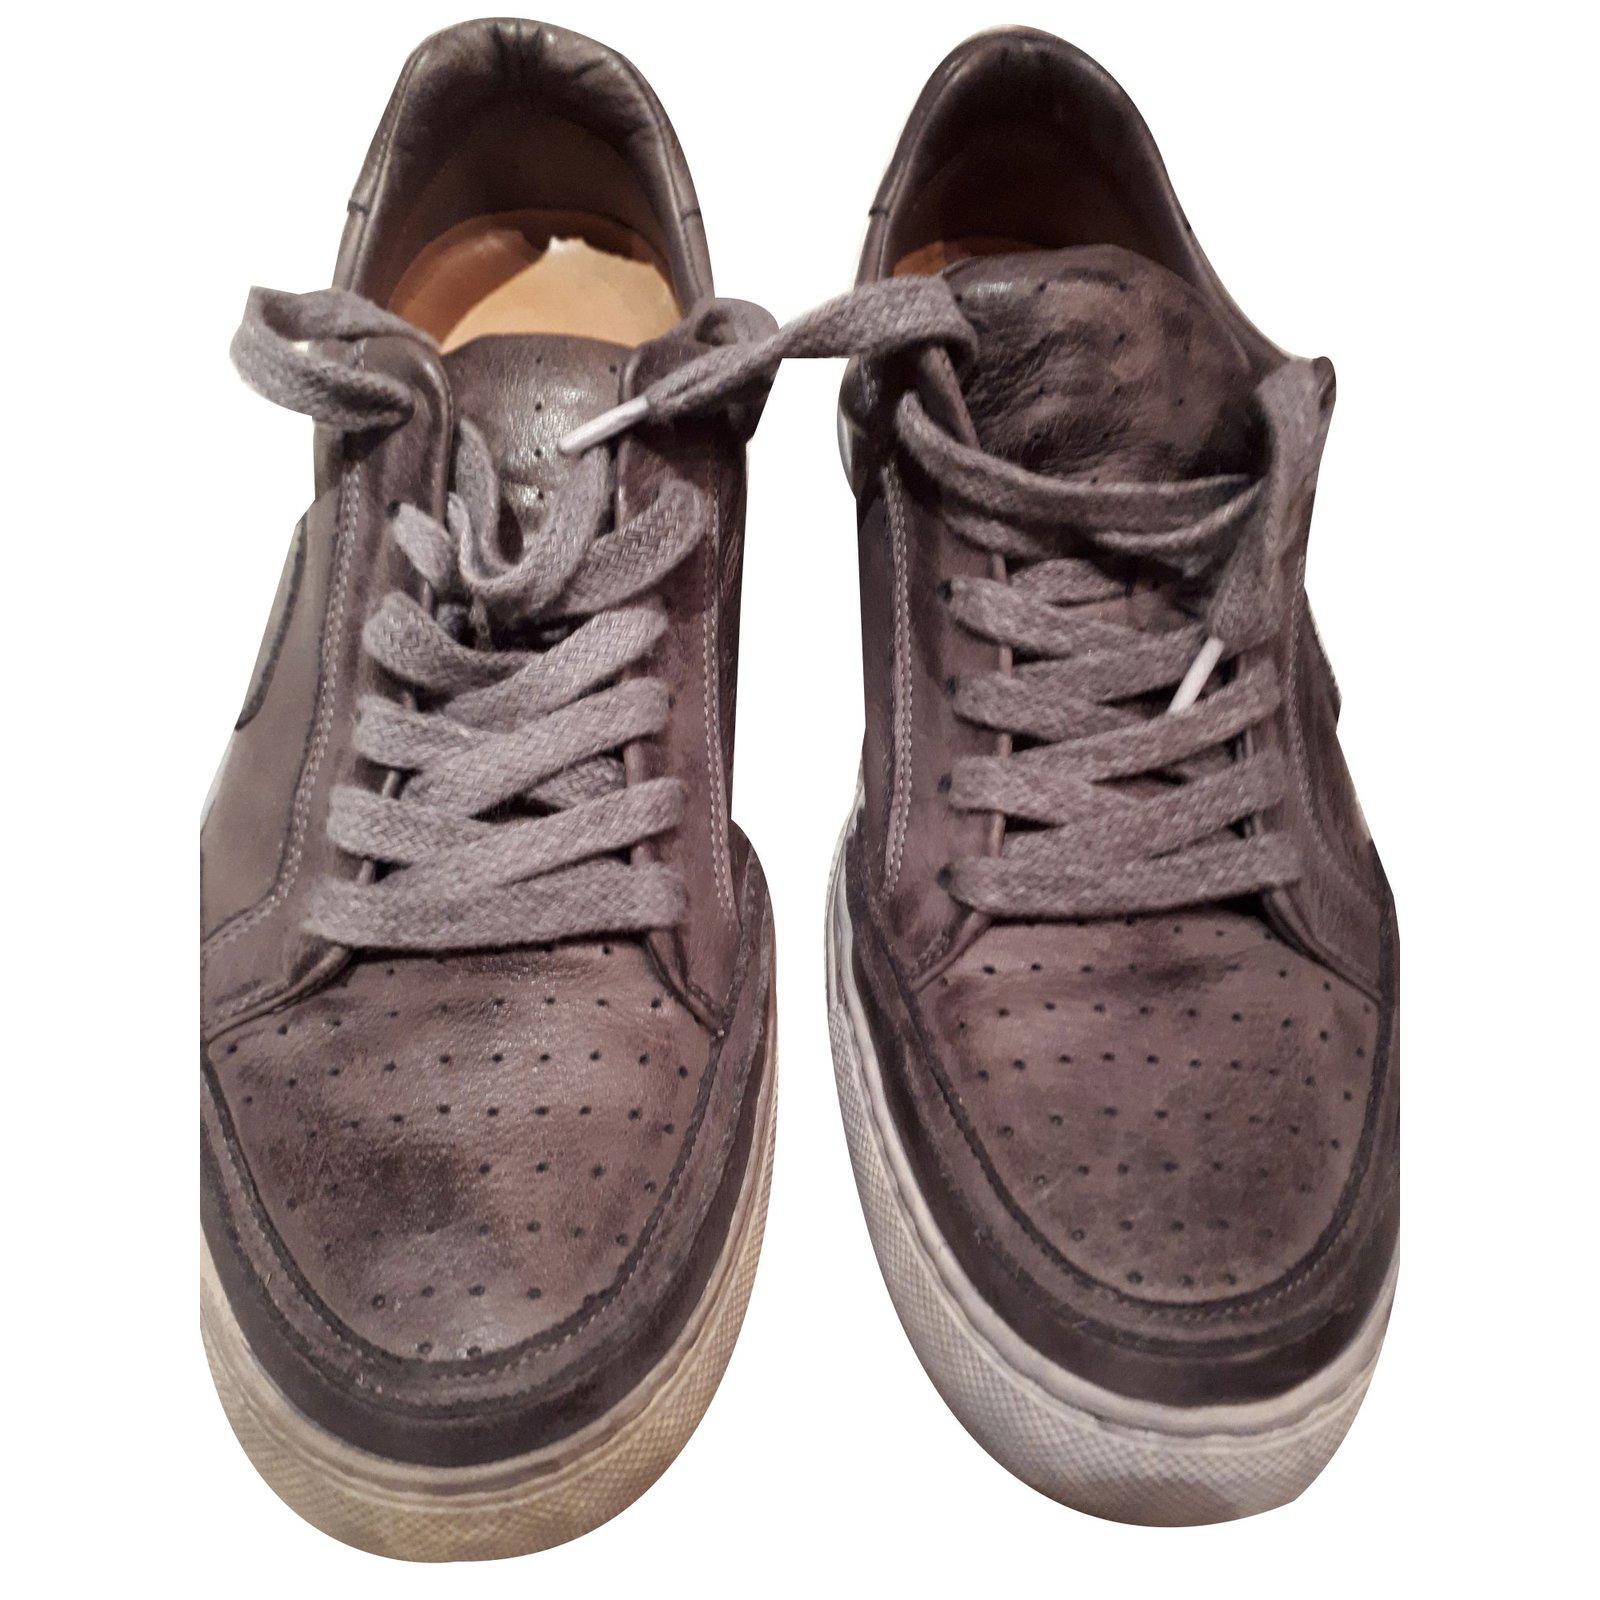 Free Lance Sneakers 5eedKCjS